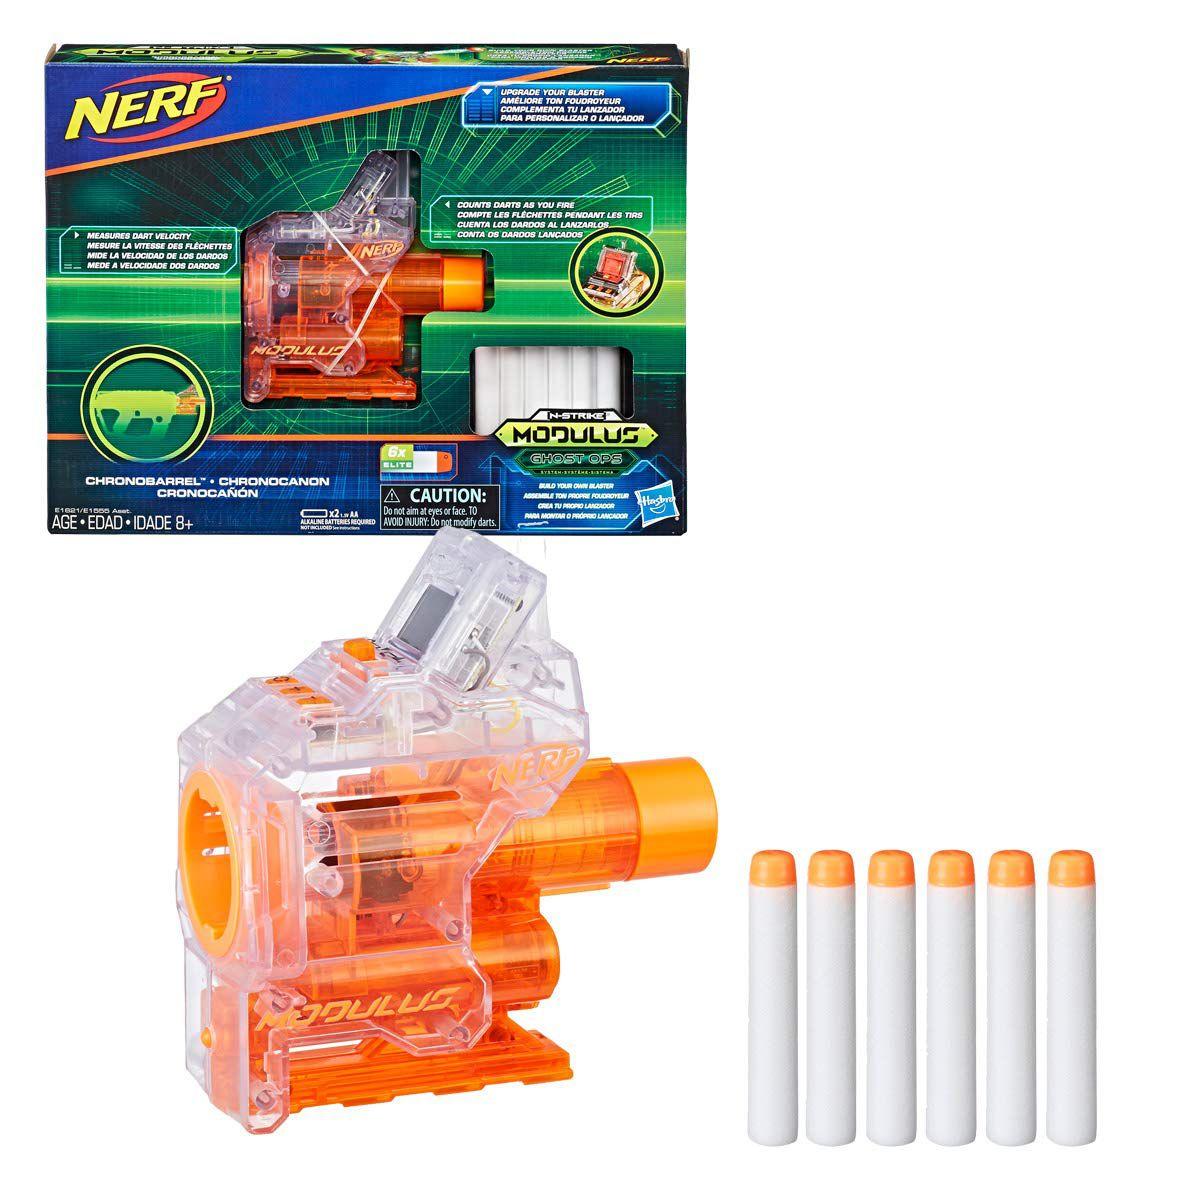 Kit Acessórios Nerf - Modulus - Chronobarrel - Hasbro E1621